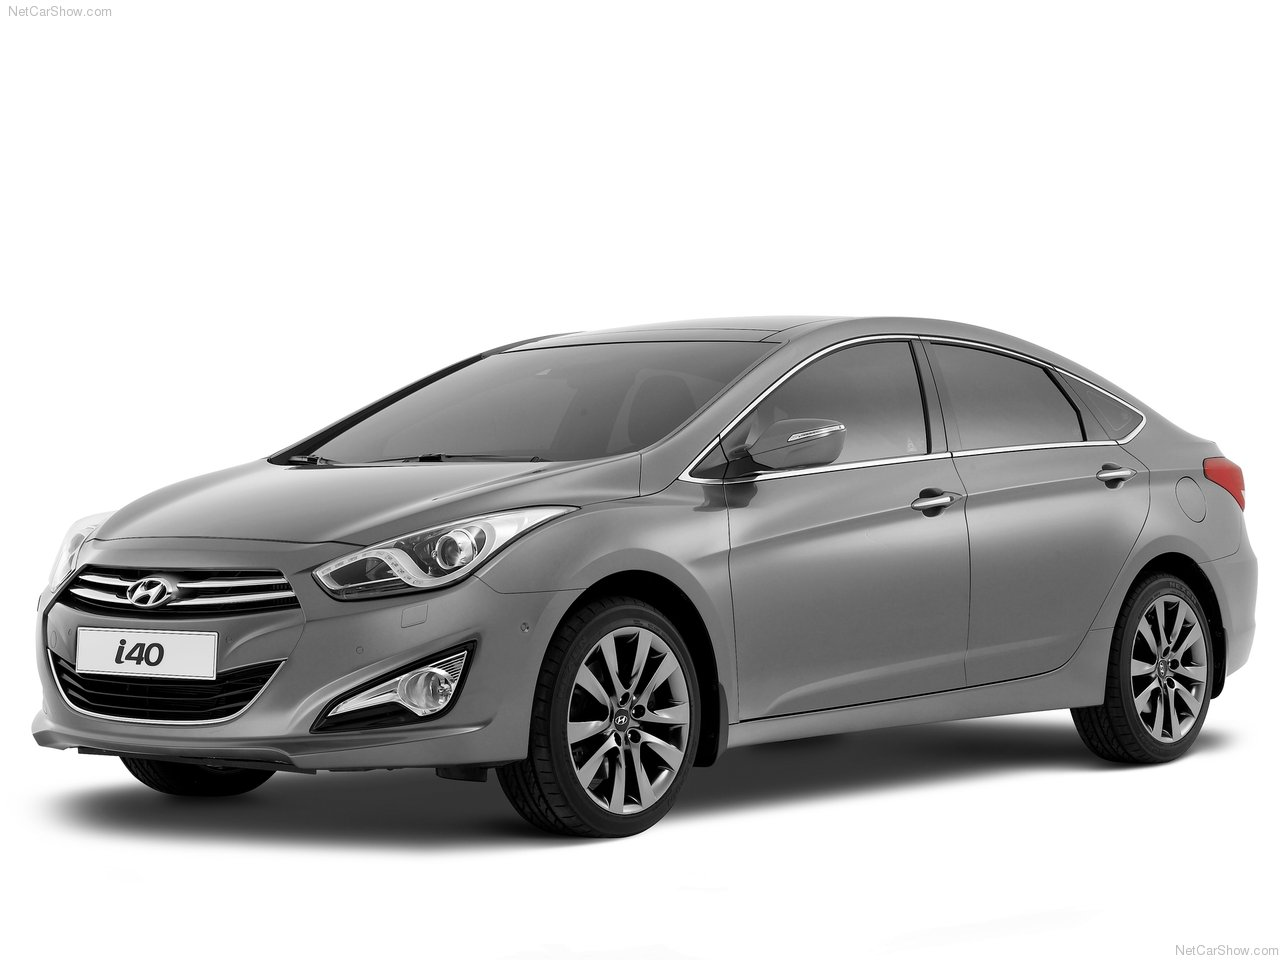 http://3.bp.blogspot.com/-8tdxI02I8tY/TfAtV4ZR-ZI/AAAAAAAAC7M/oITjPX9ni9A/s1600/Hyundai-i40_2012_1280x960_wallpaper_02.jpg